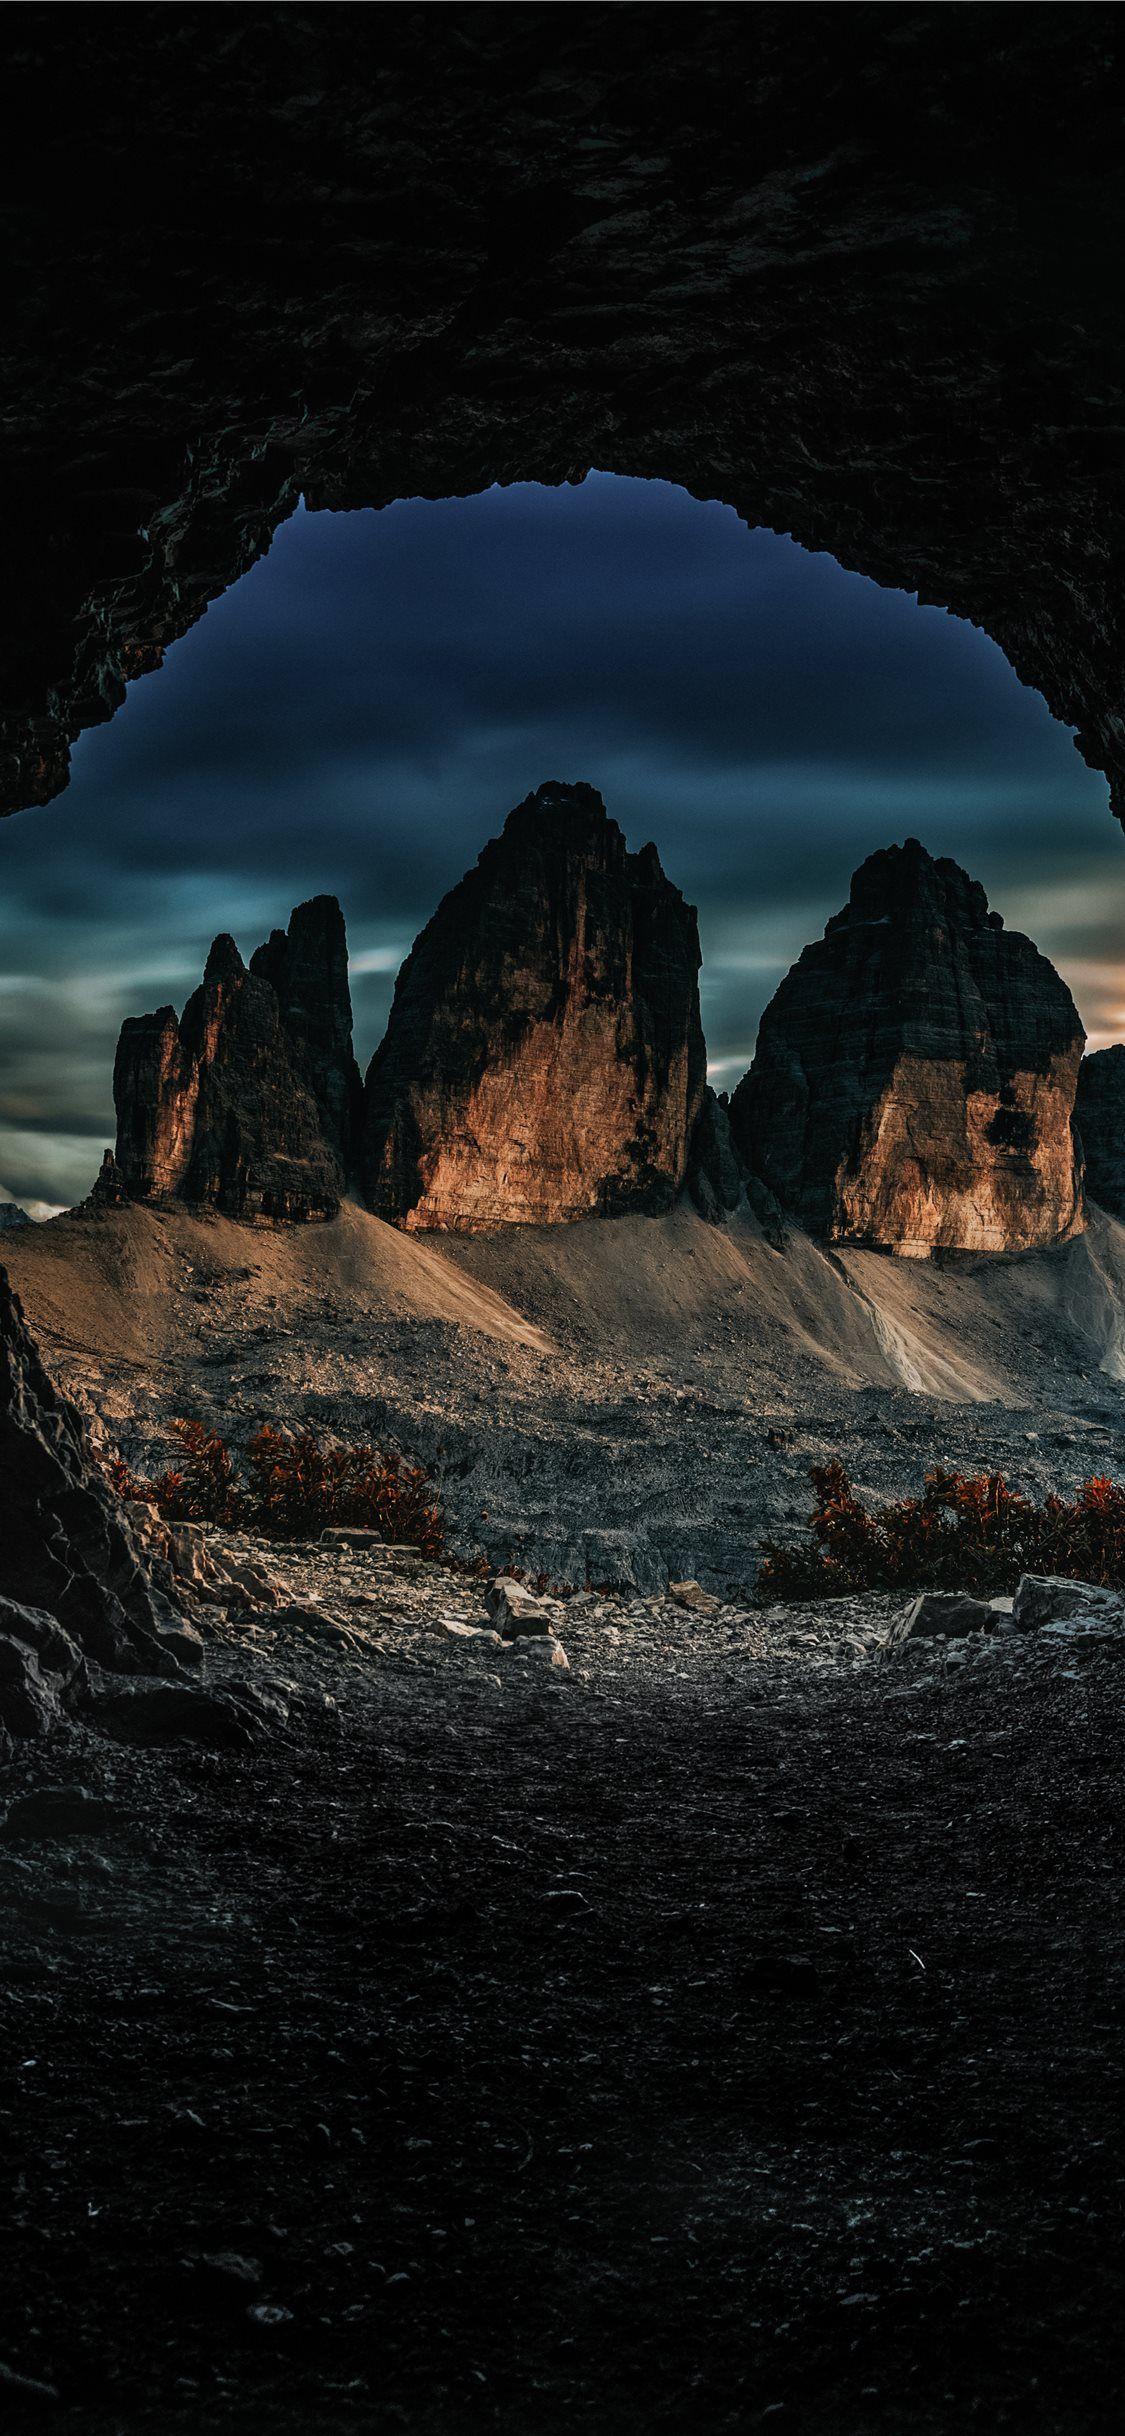 Three peaks of Lavaredo androidwallpaper moon night